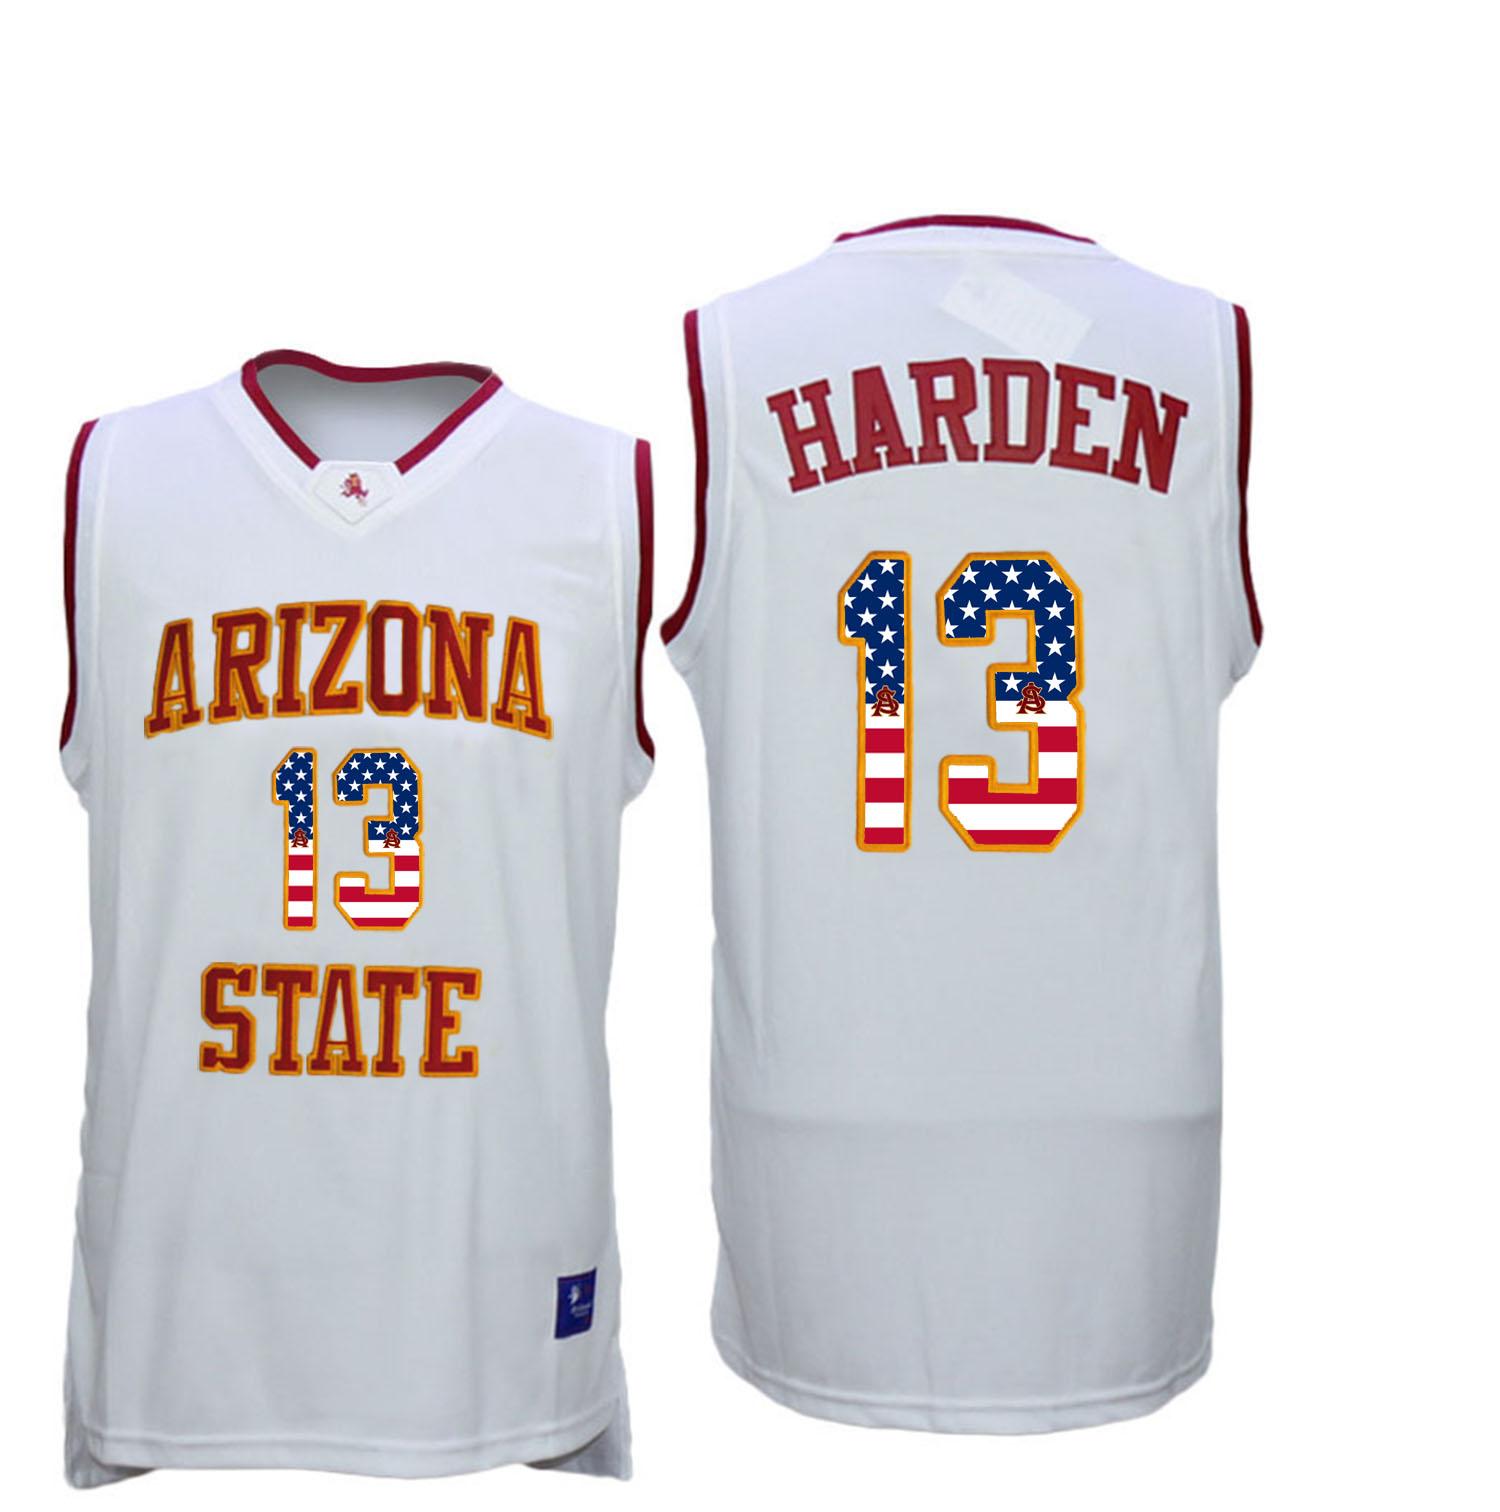 Arizona State Sun Devils 13 James Harden 13 White College Basketball Jersey